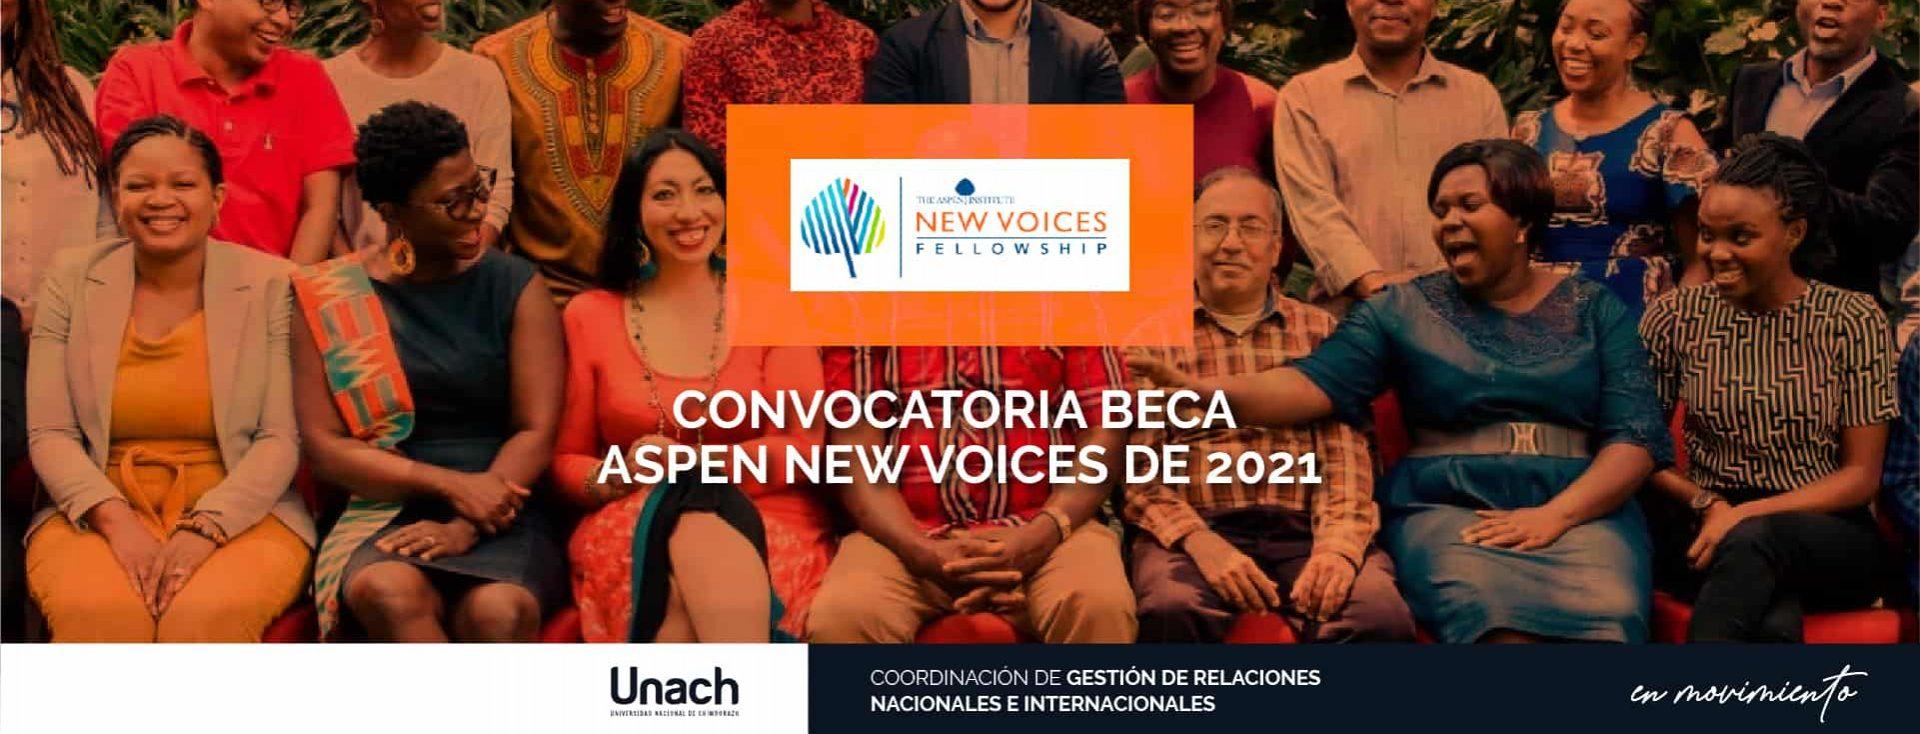 BECA ASPEN NEW VOICES DE 2021